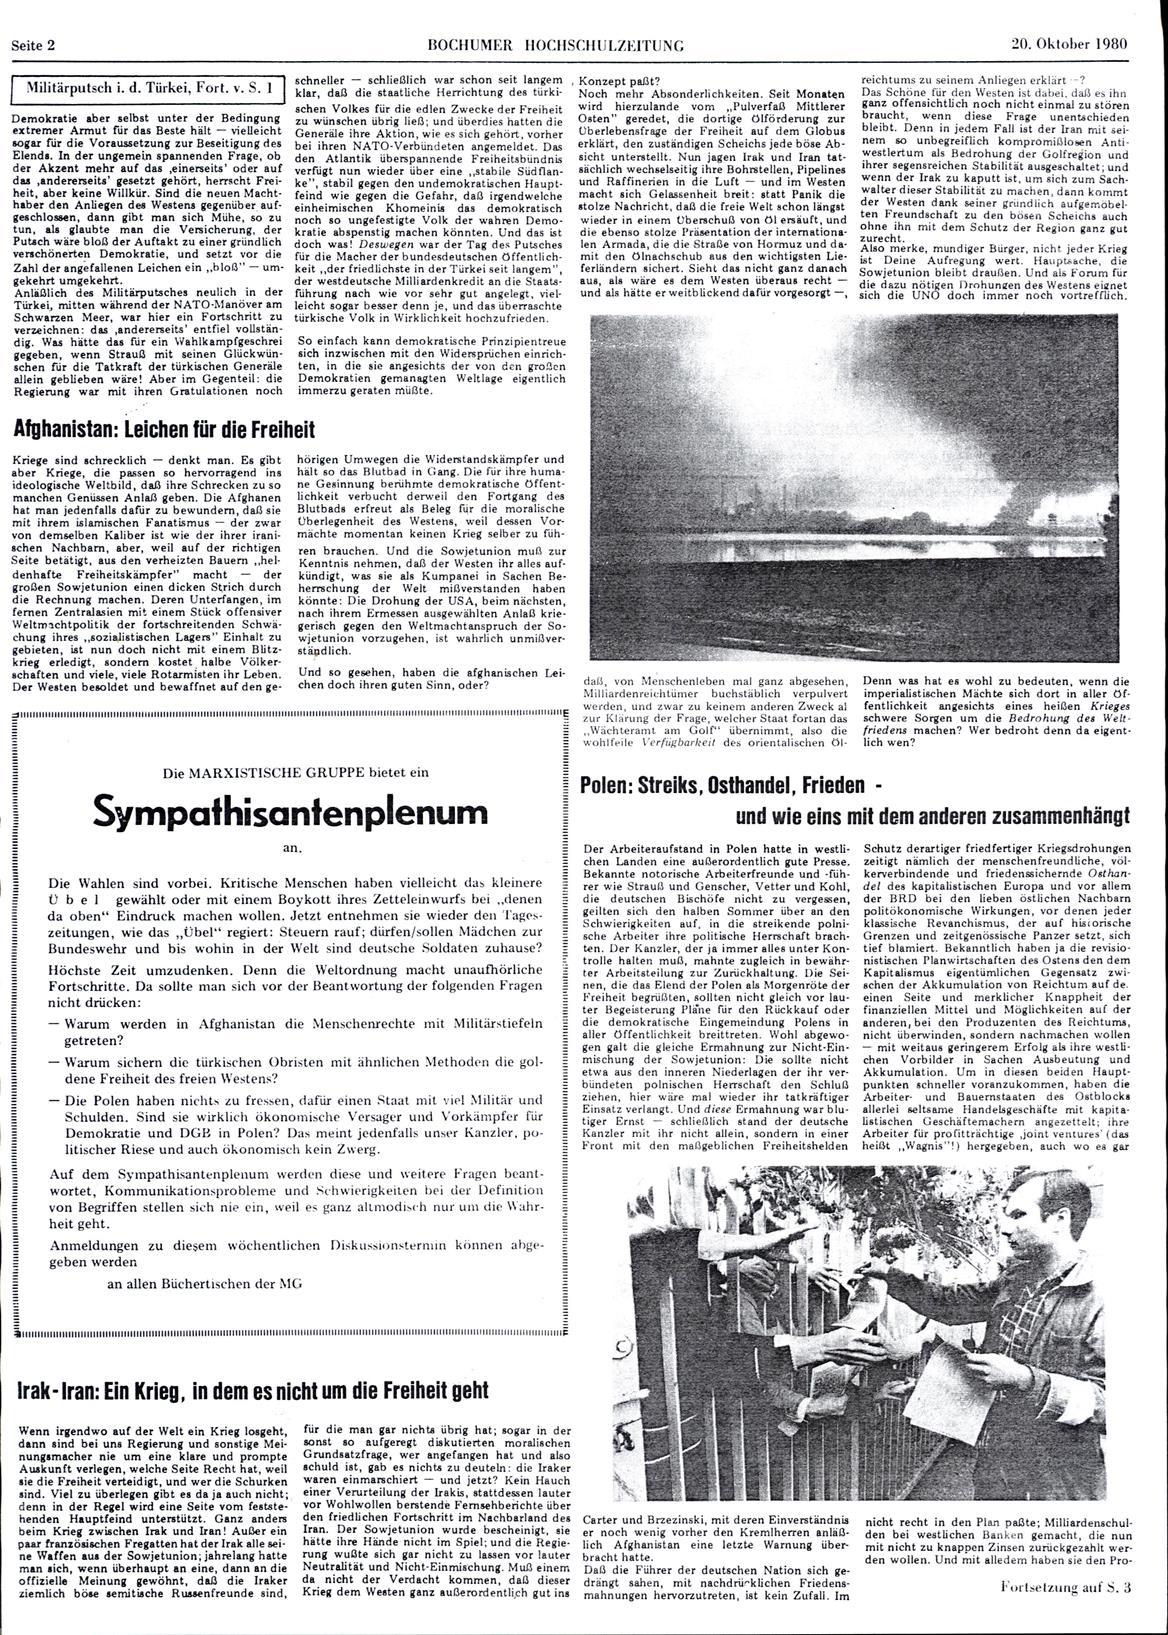 Bochum_BHZ_19801020_018_002